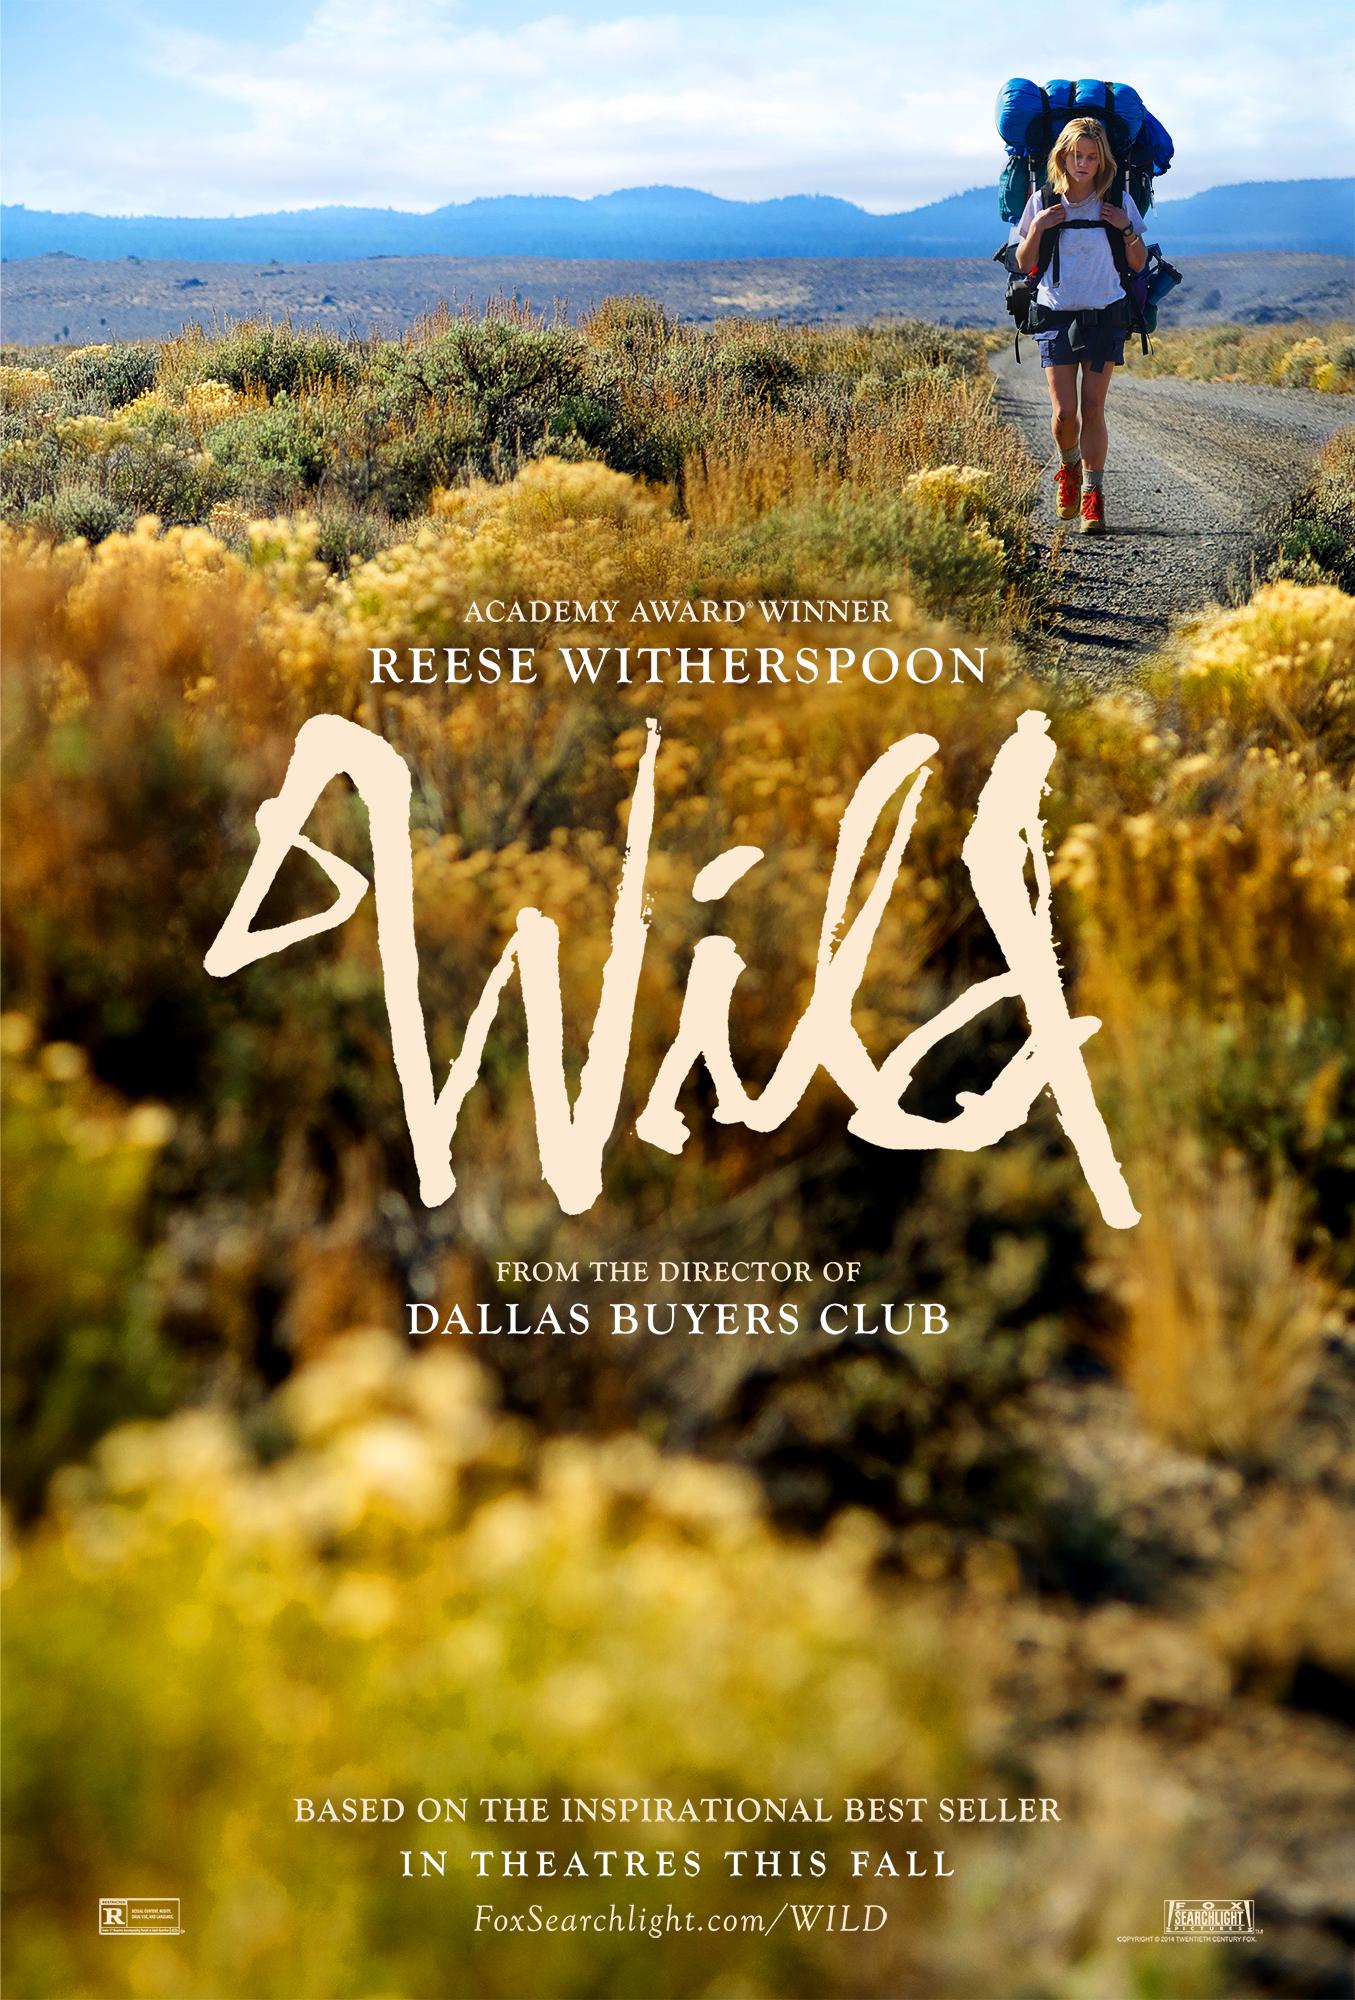 <b>NEW TRAILER: WILD...</b>